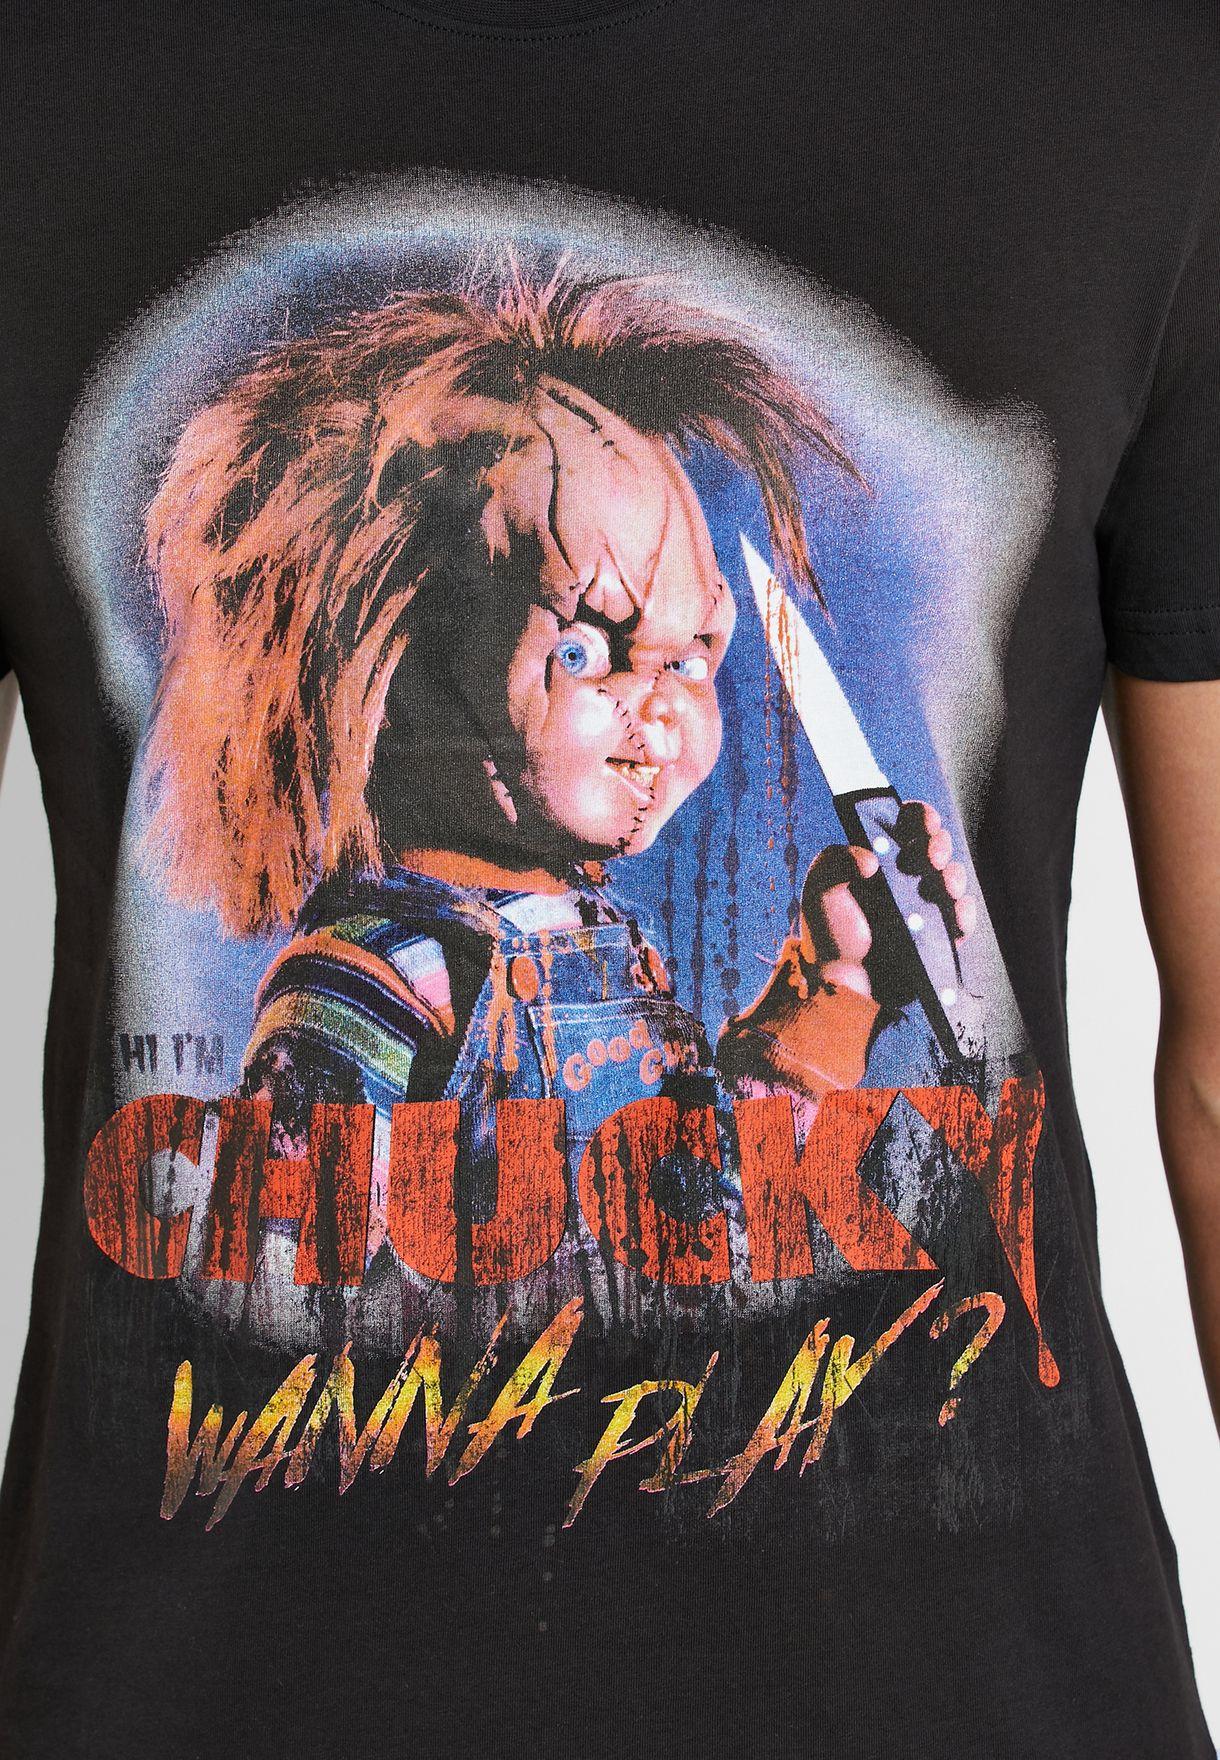 Chucky Graphic Crew Neck T-Shirt